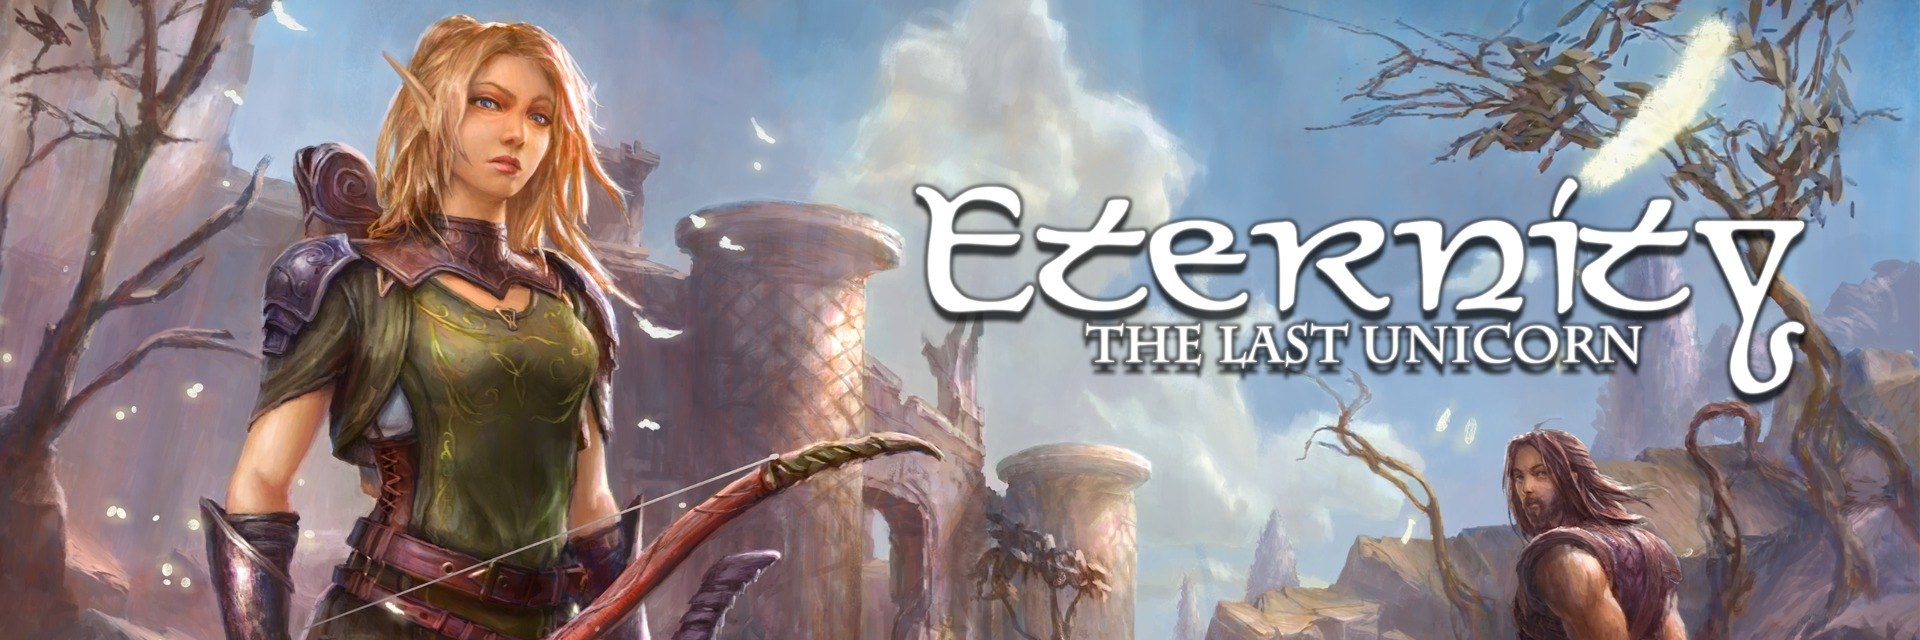 Eternity: The Last Guardian logo